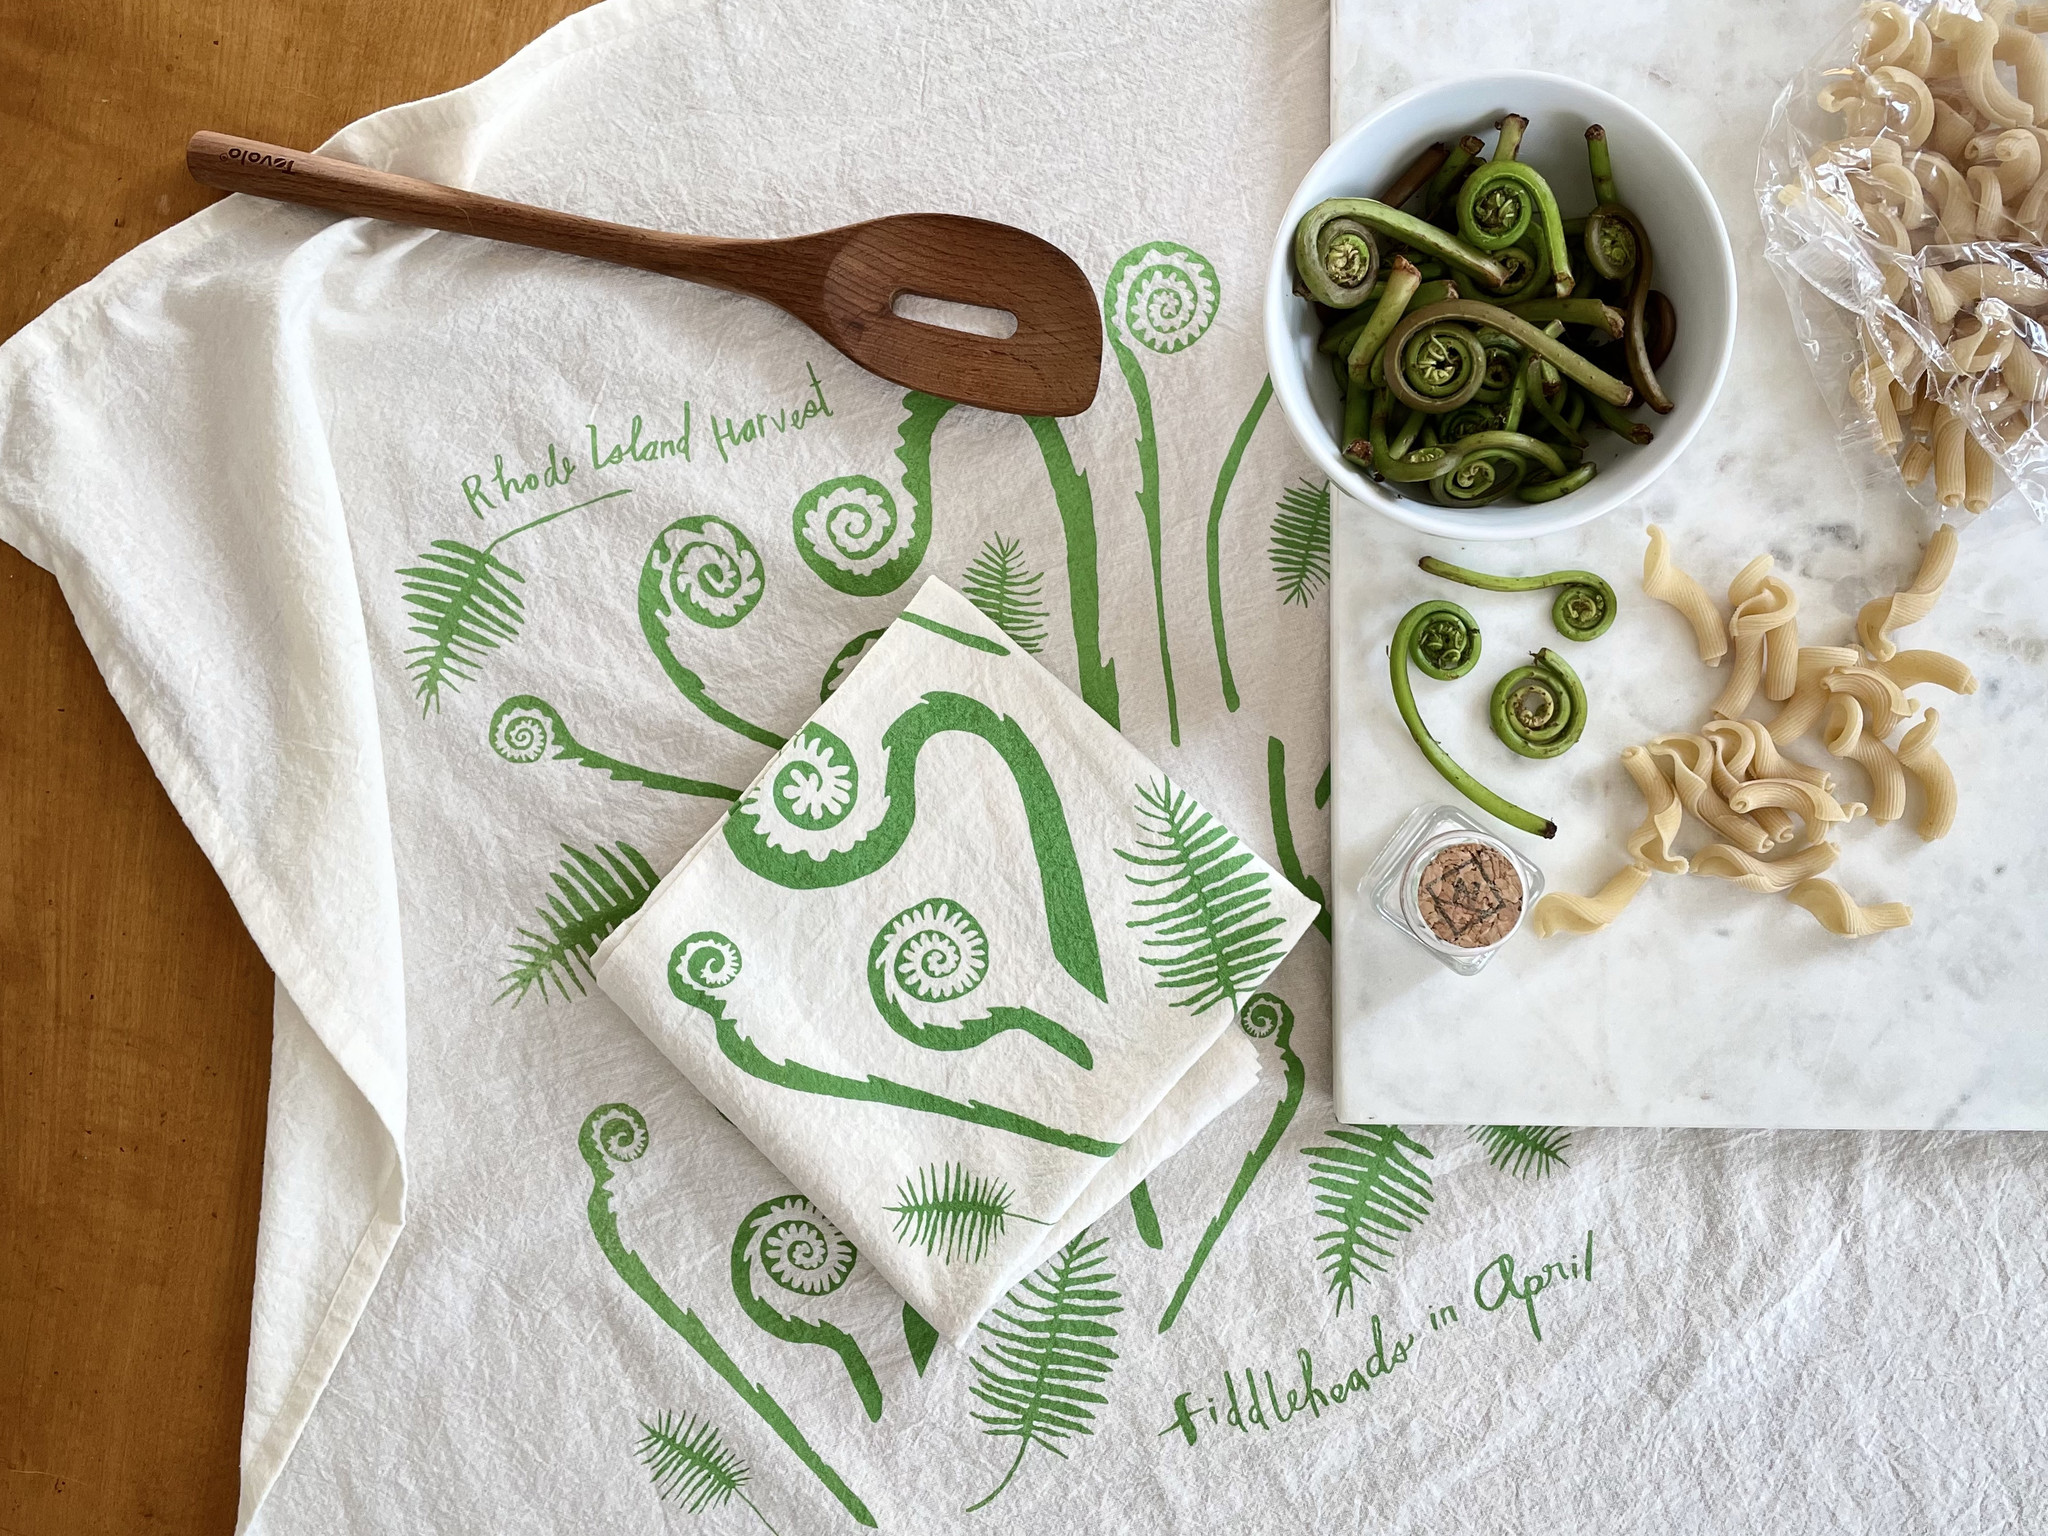 Rhode Island Harvest Tea Towels by Cricicis Design-8